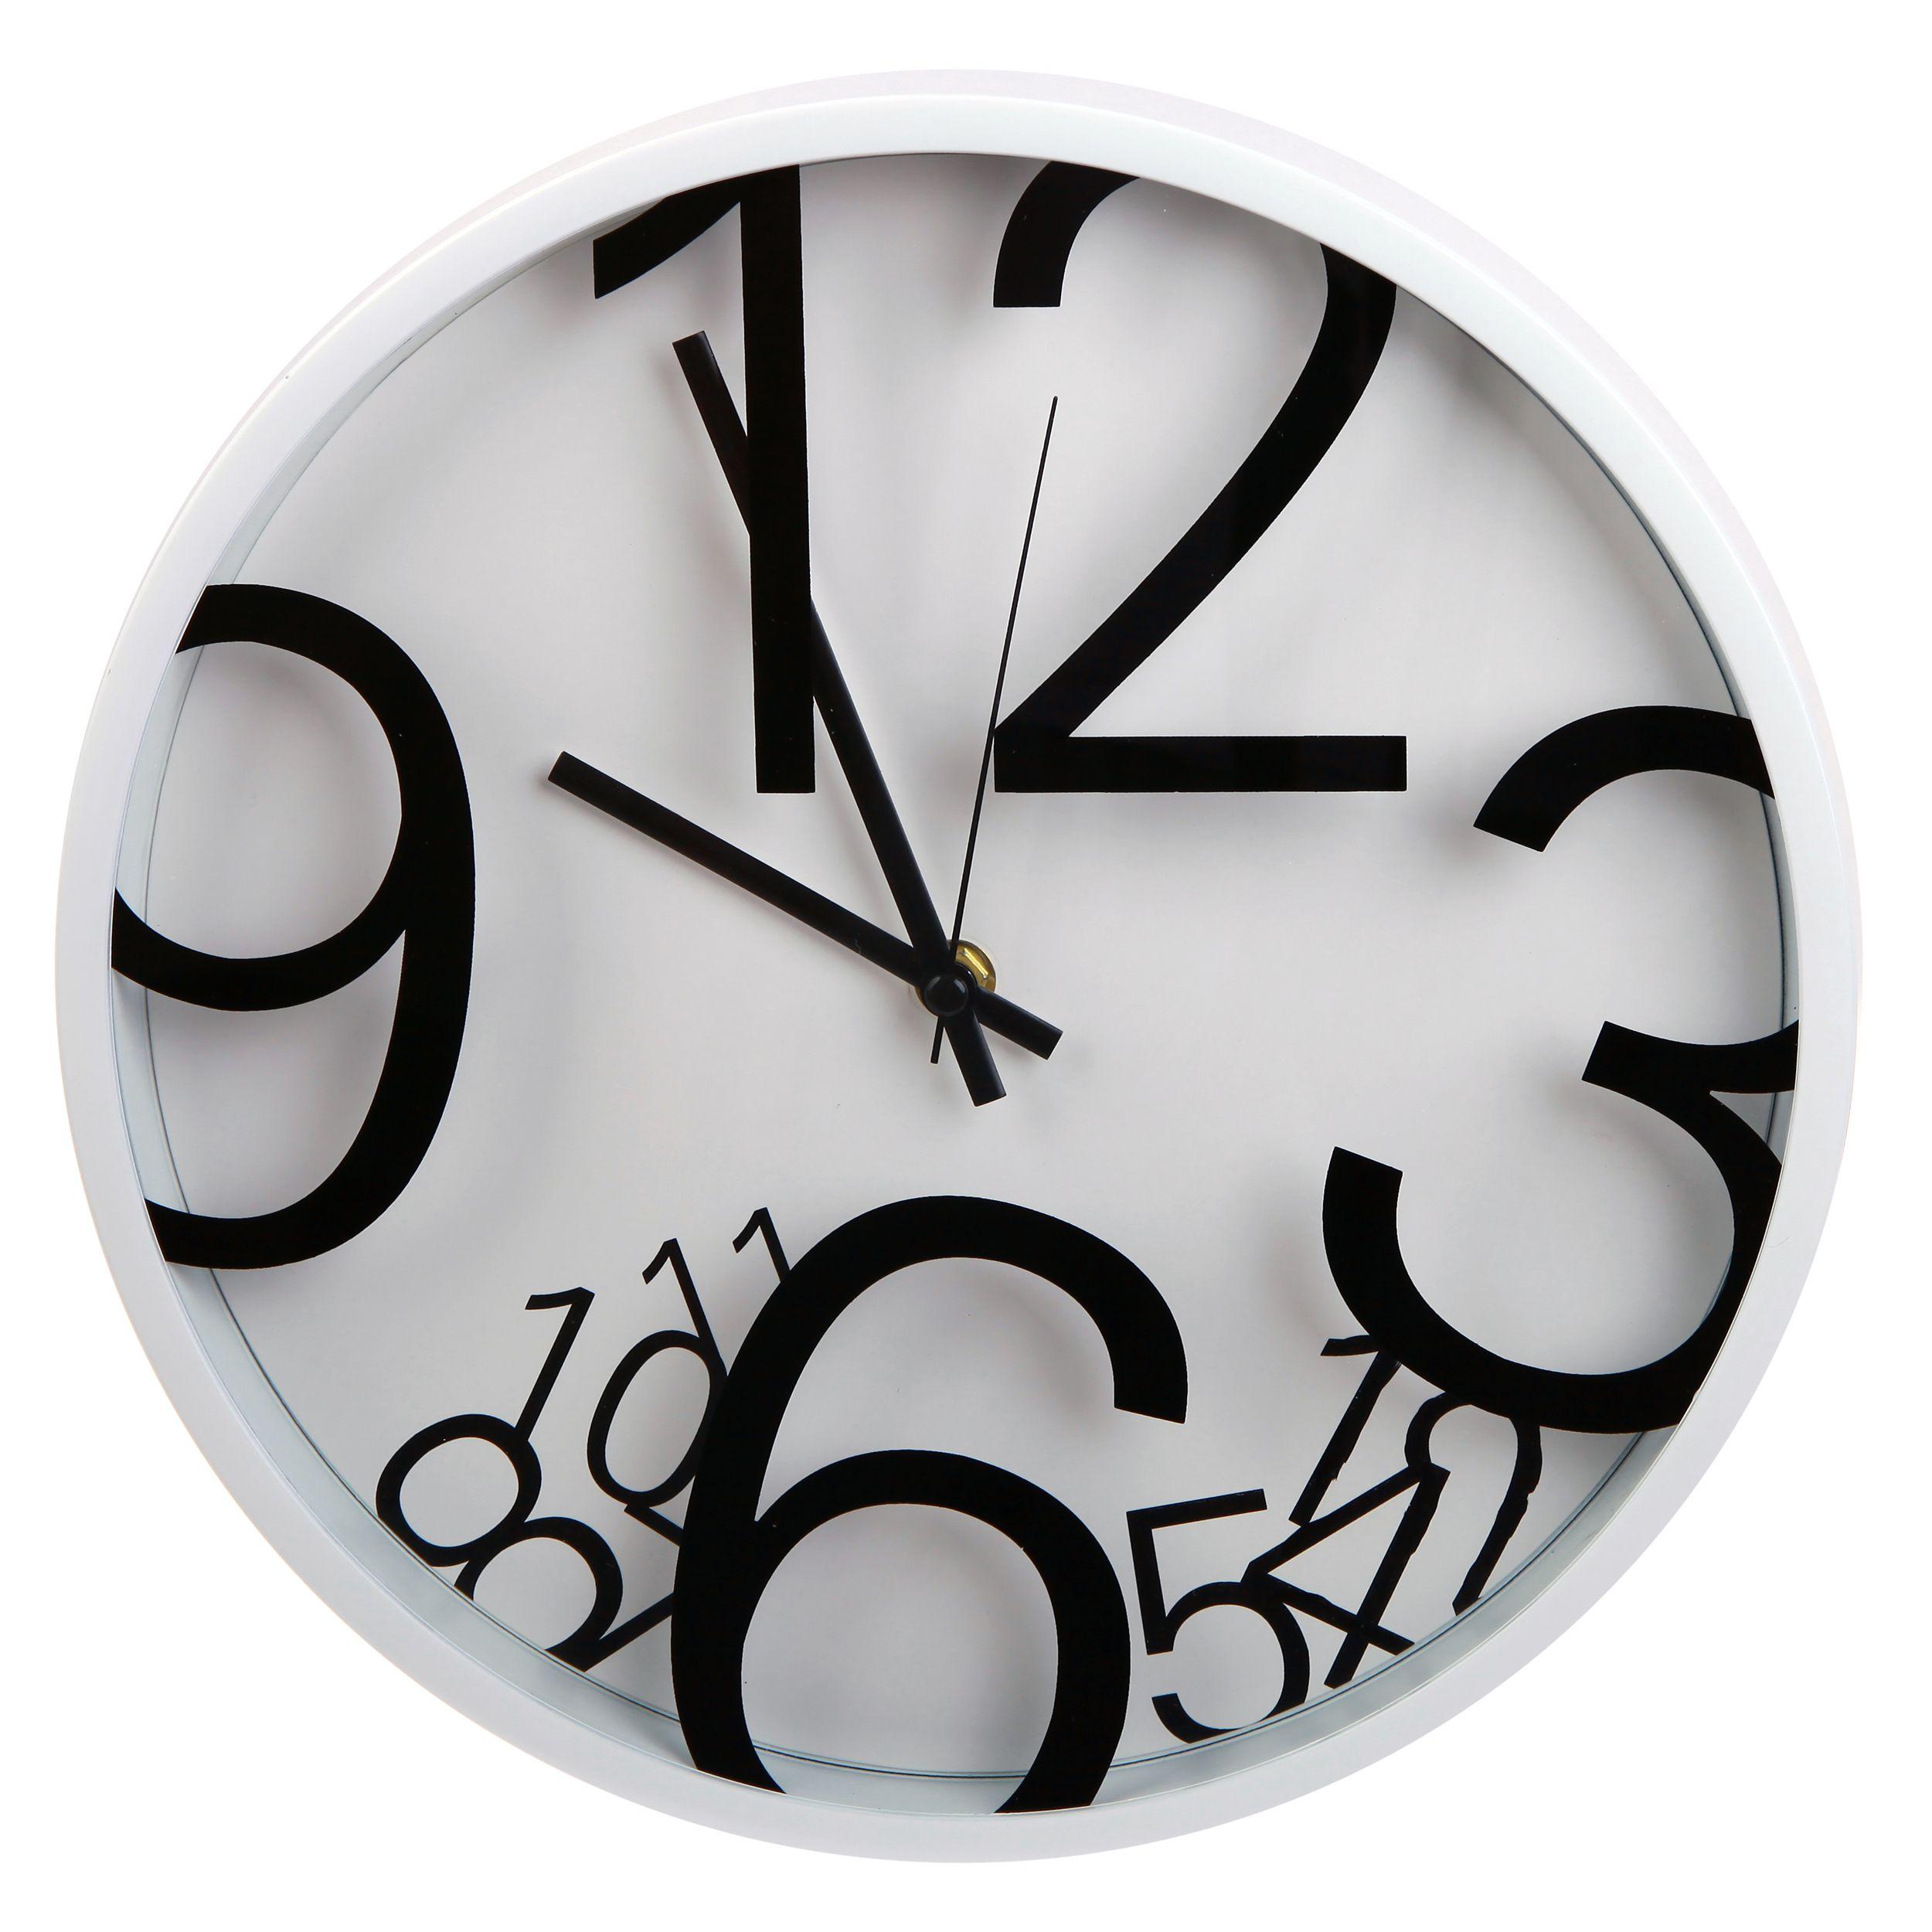 Lgi quartz wall clock modern contemporary wall clock white lgi quartz wall clock modern contemporary wall clock amipublicfo Images